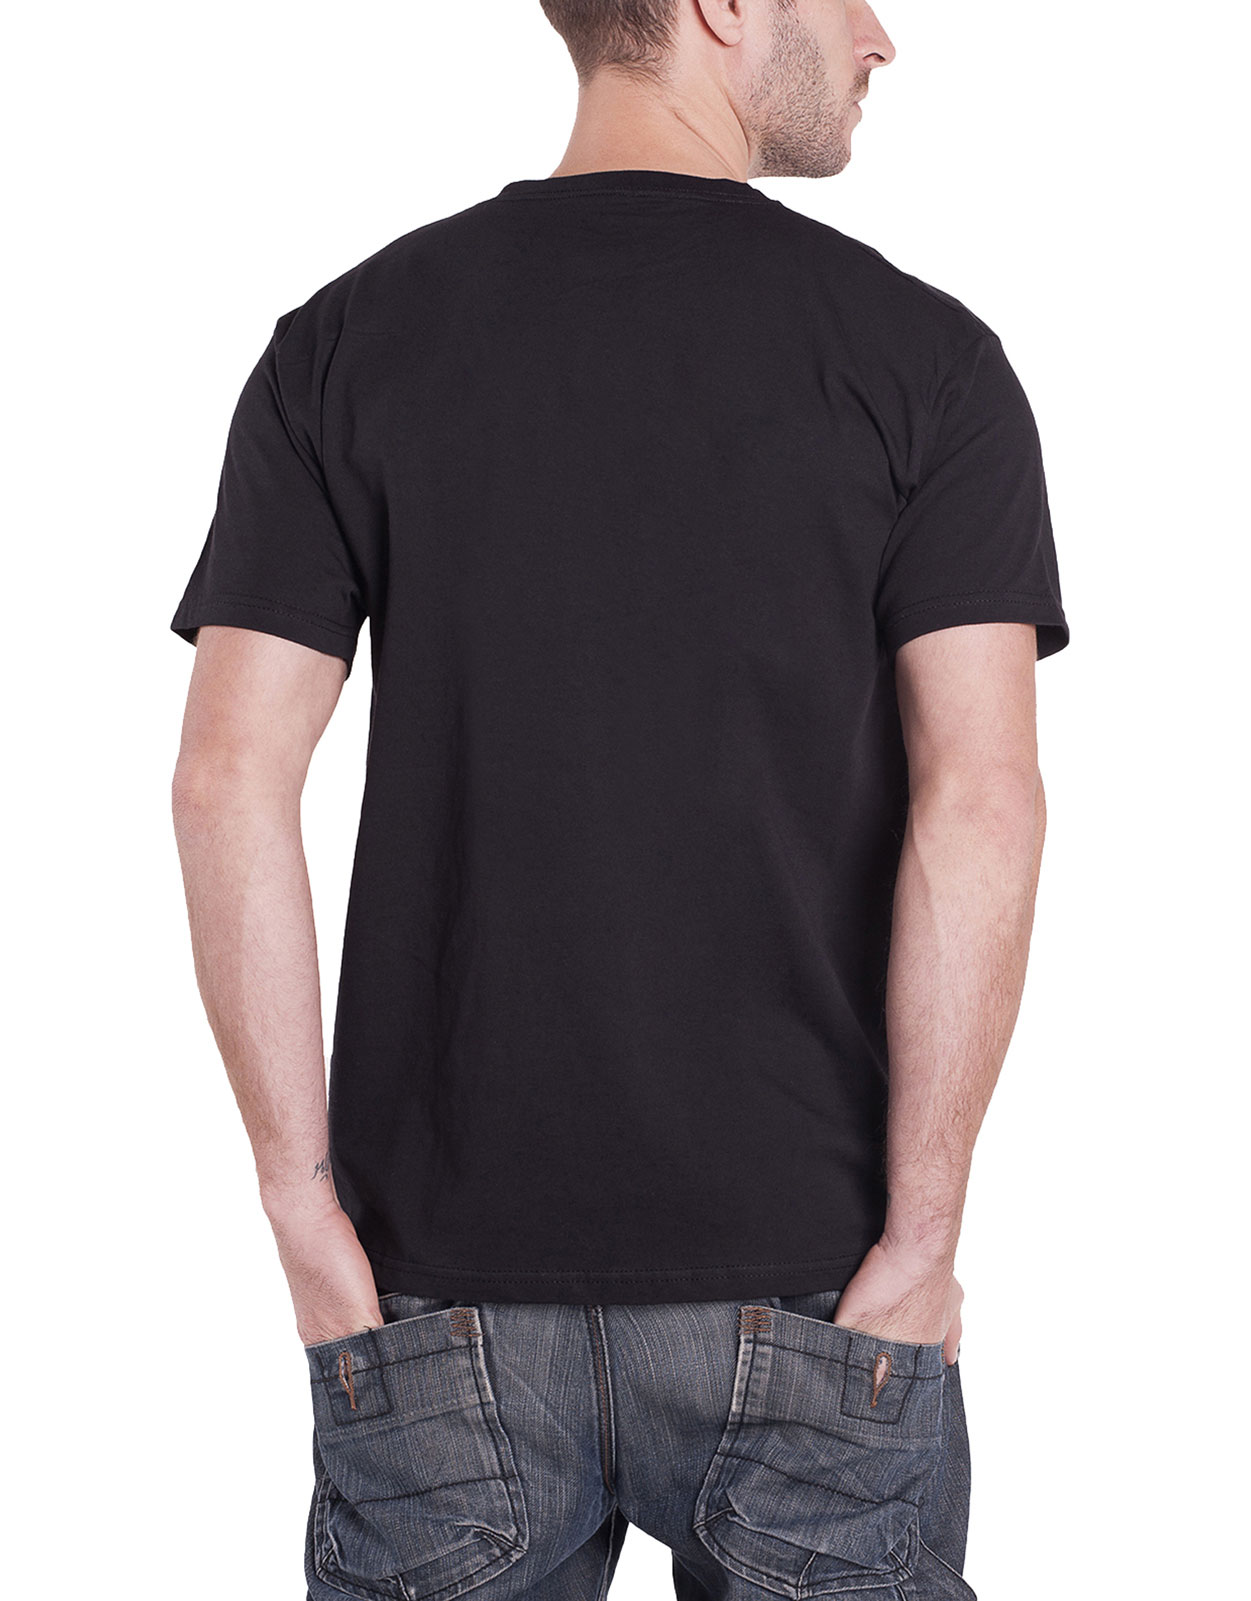 Camiseta-Last-Jedi-De-Star-Wars-Movie-Poster-porgs-Guardia-pretoriana-oficial-para-hombre miniatura 21